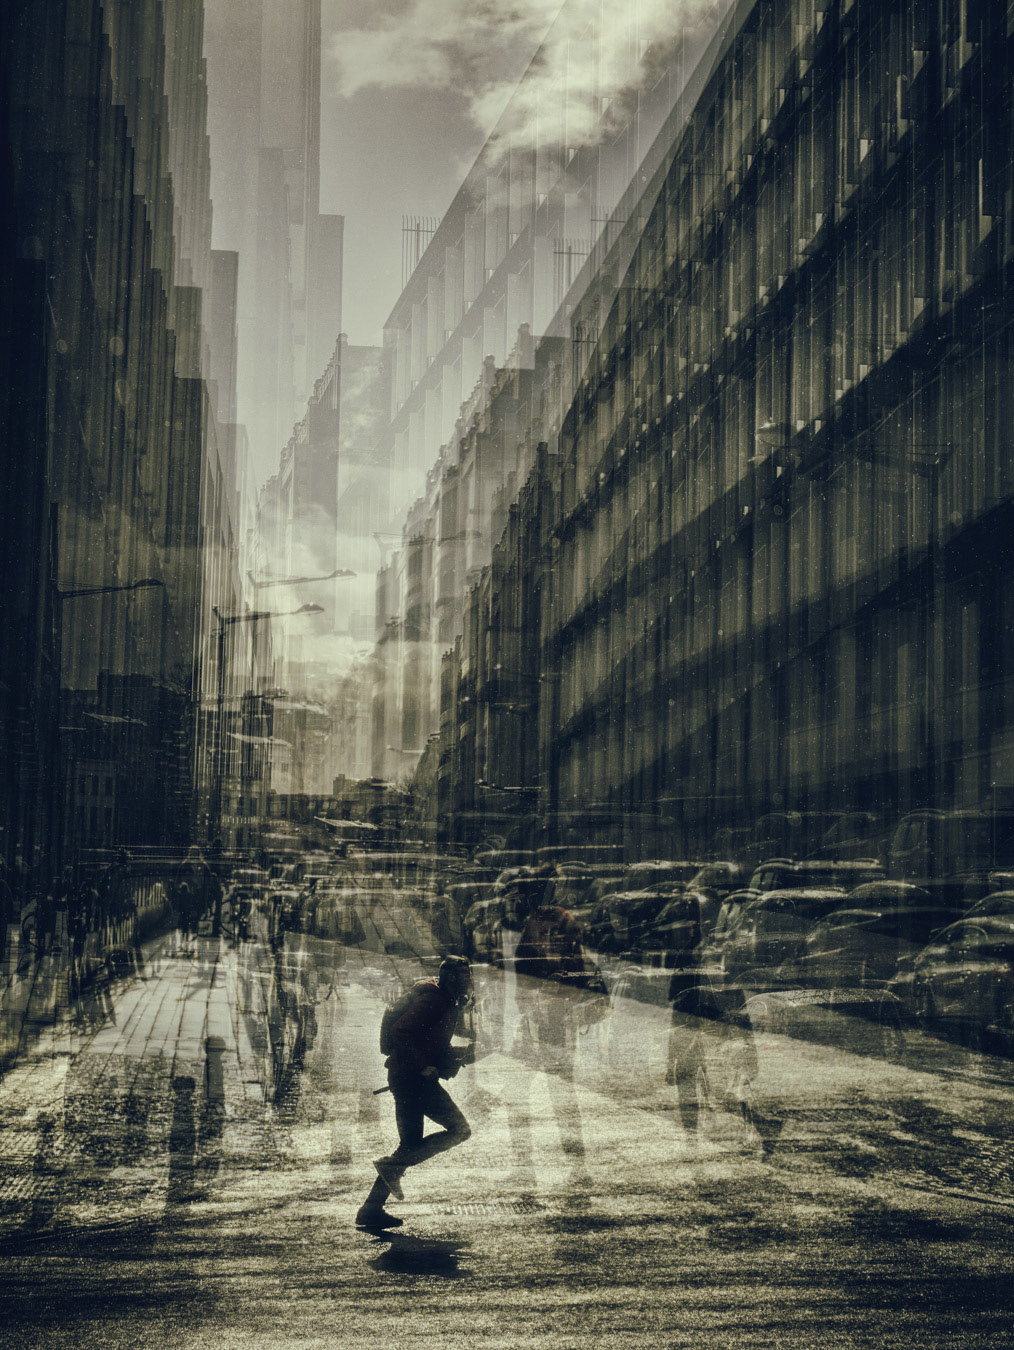 Thomas Vanoost - Instability series 2